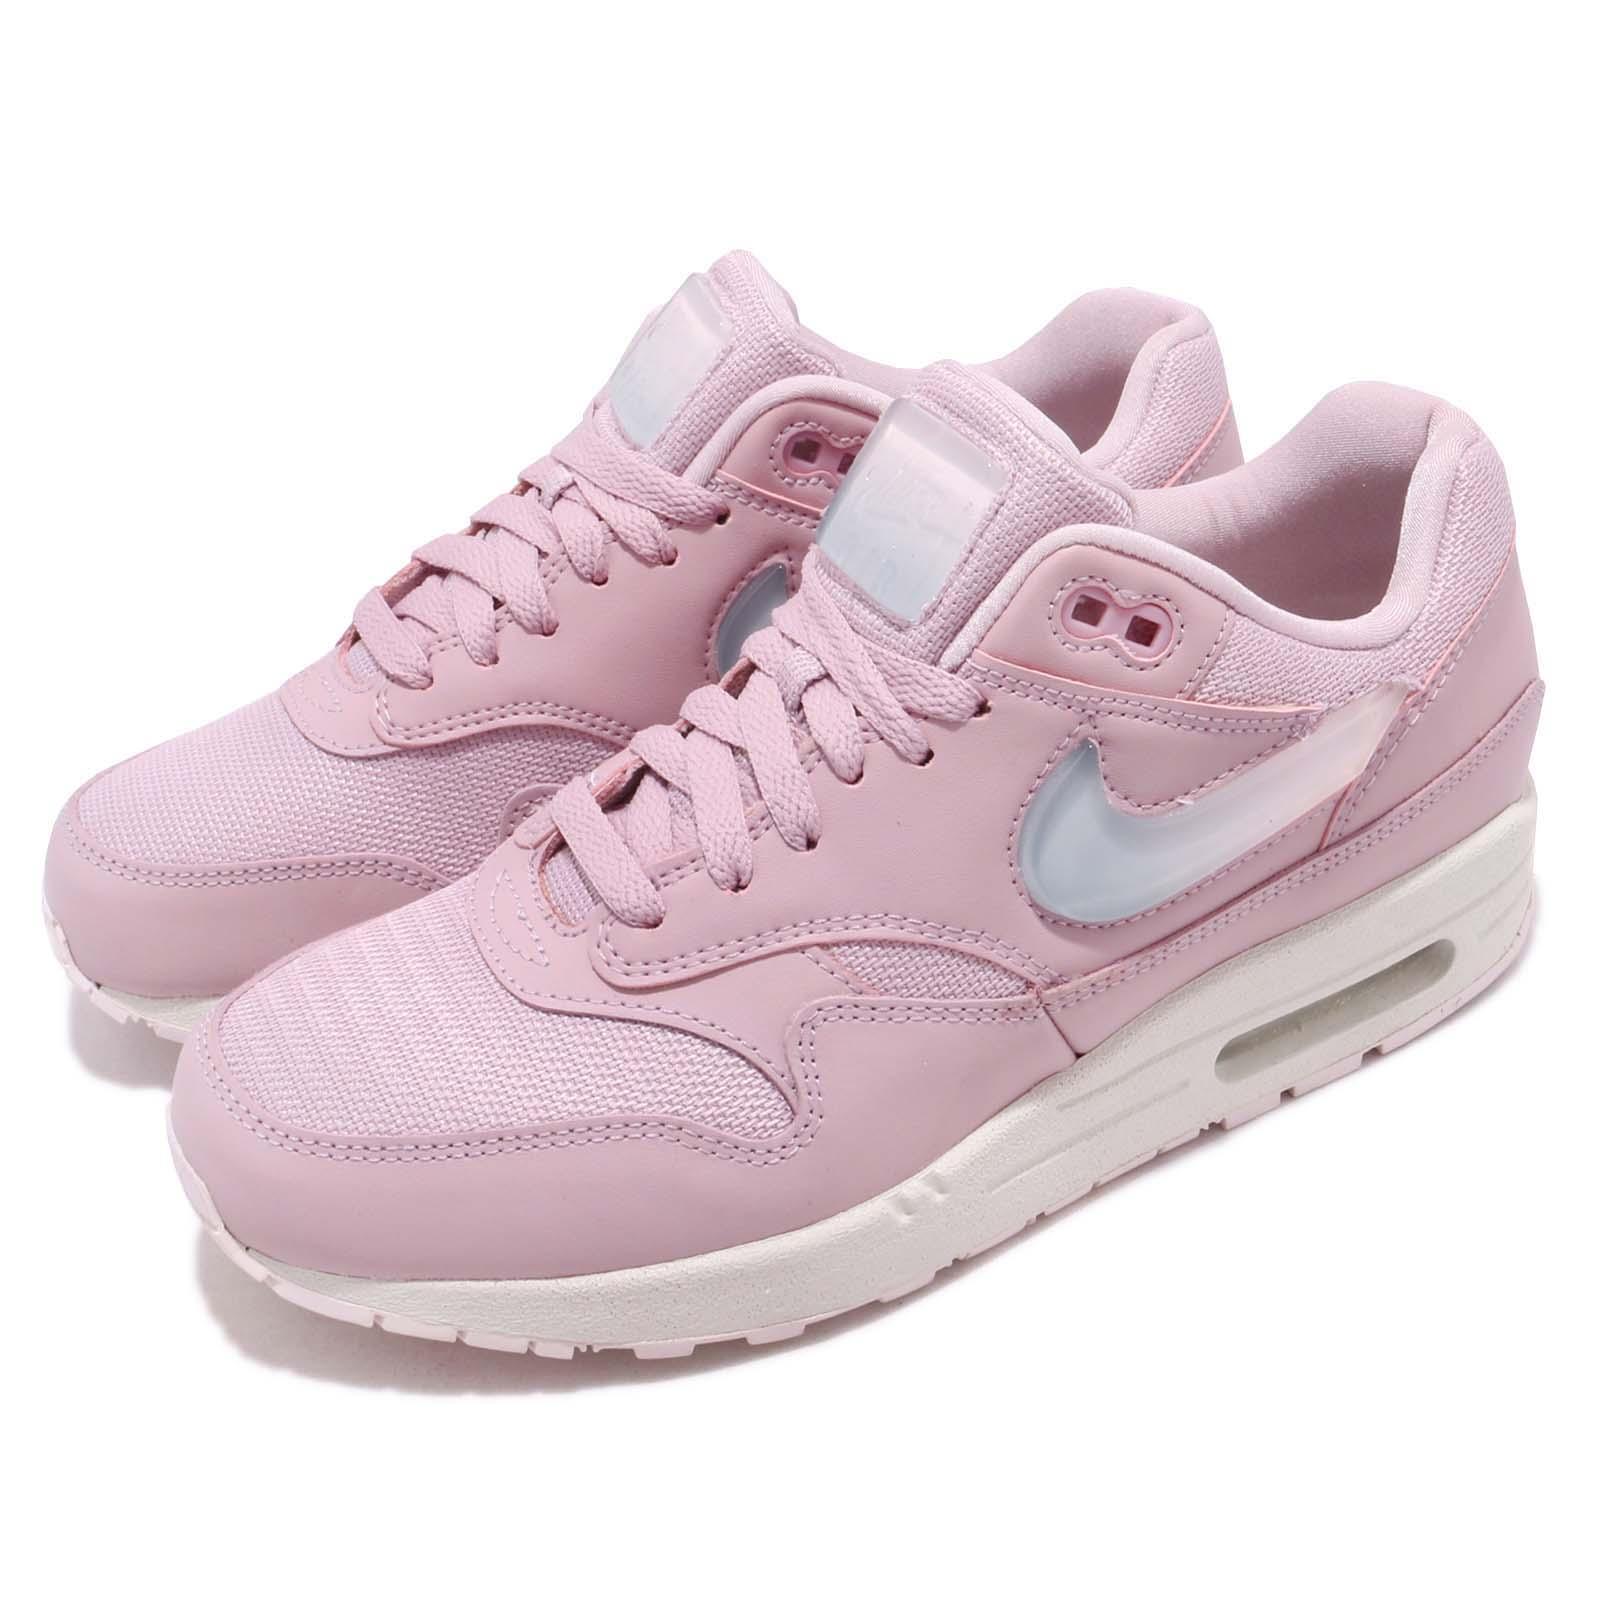 Nike 休閒鞋 Air Max 1 JP 女鞋 AT5248-500